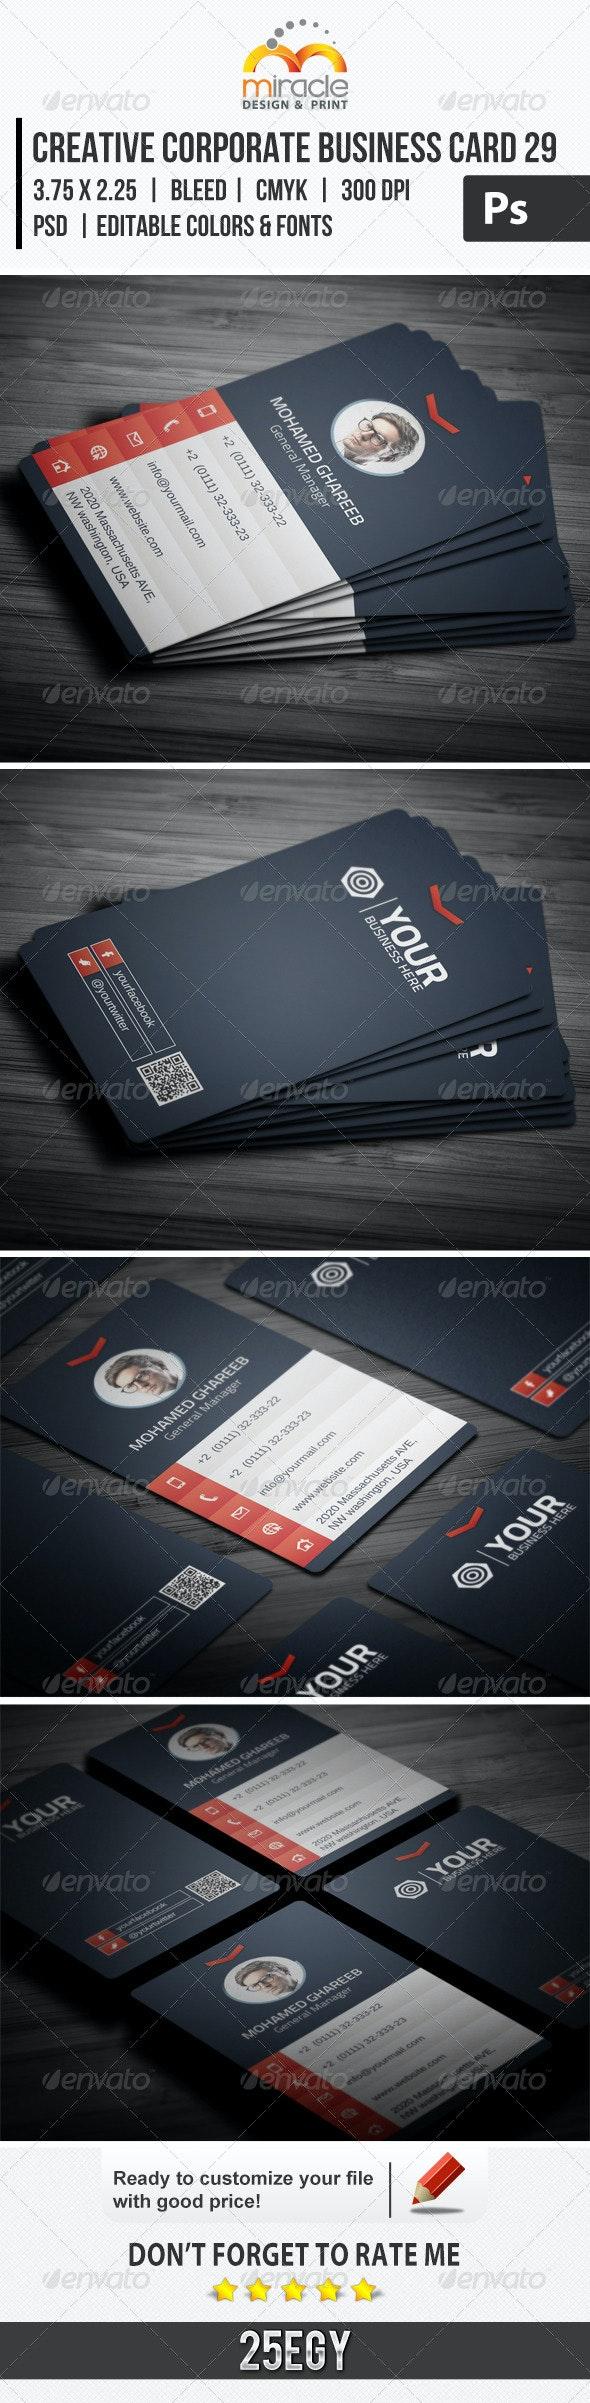 Creative Corporate Business Card 29 - Corporate Business Cards